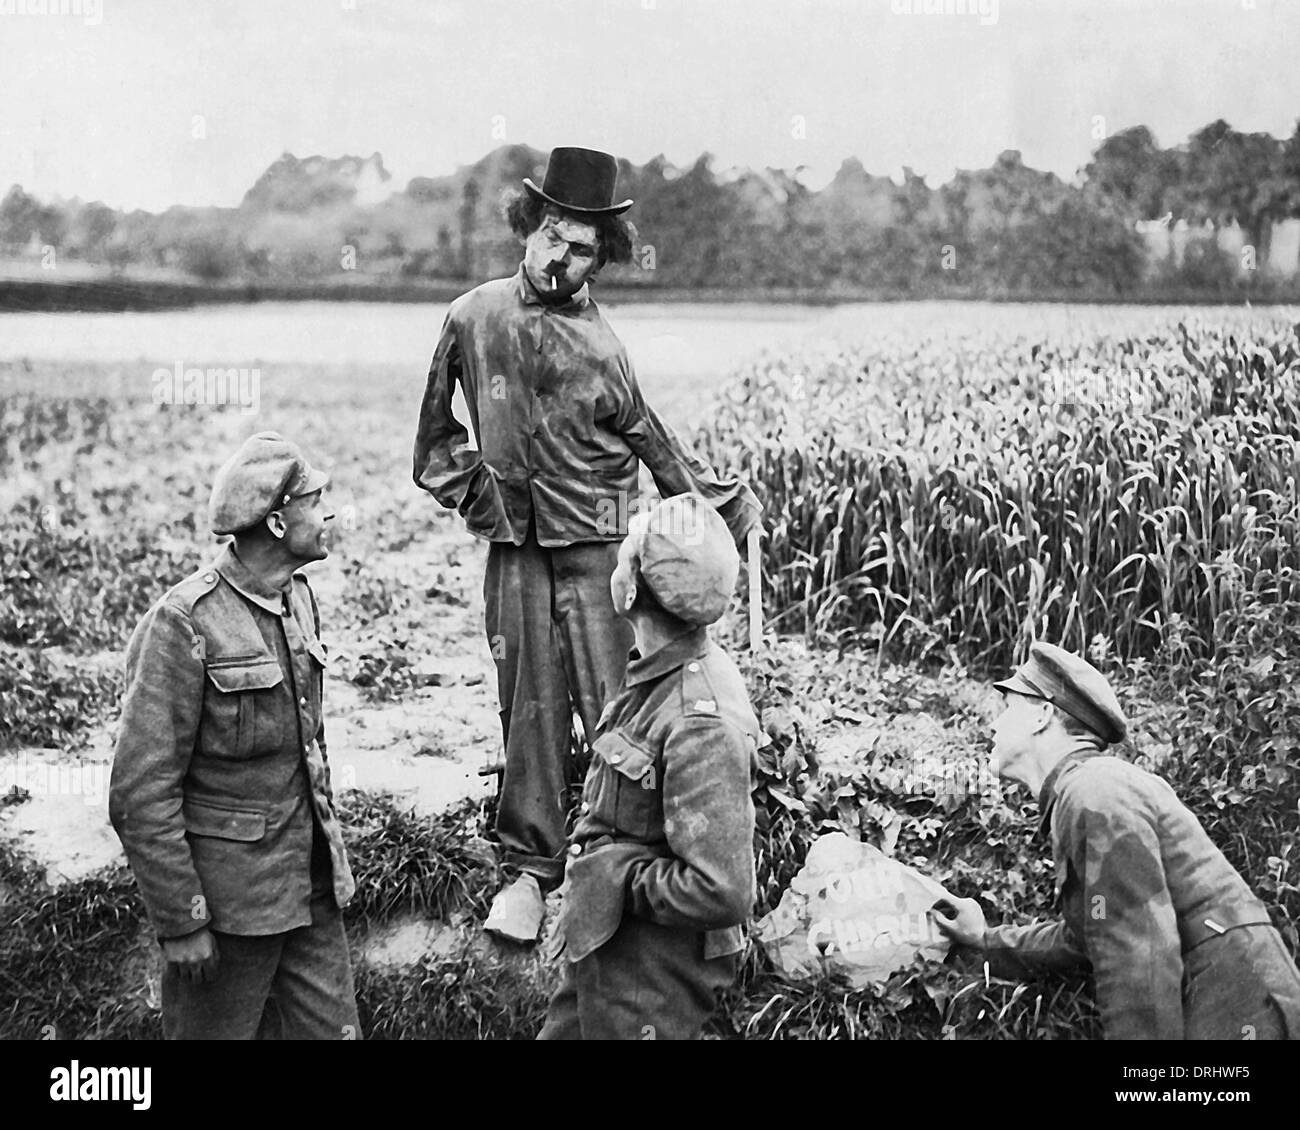 Motor transport troops, Western Front, France, WW1 - Stock Image